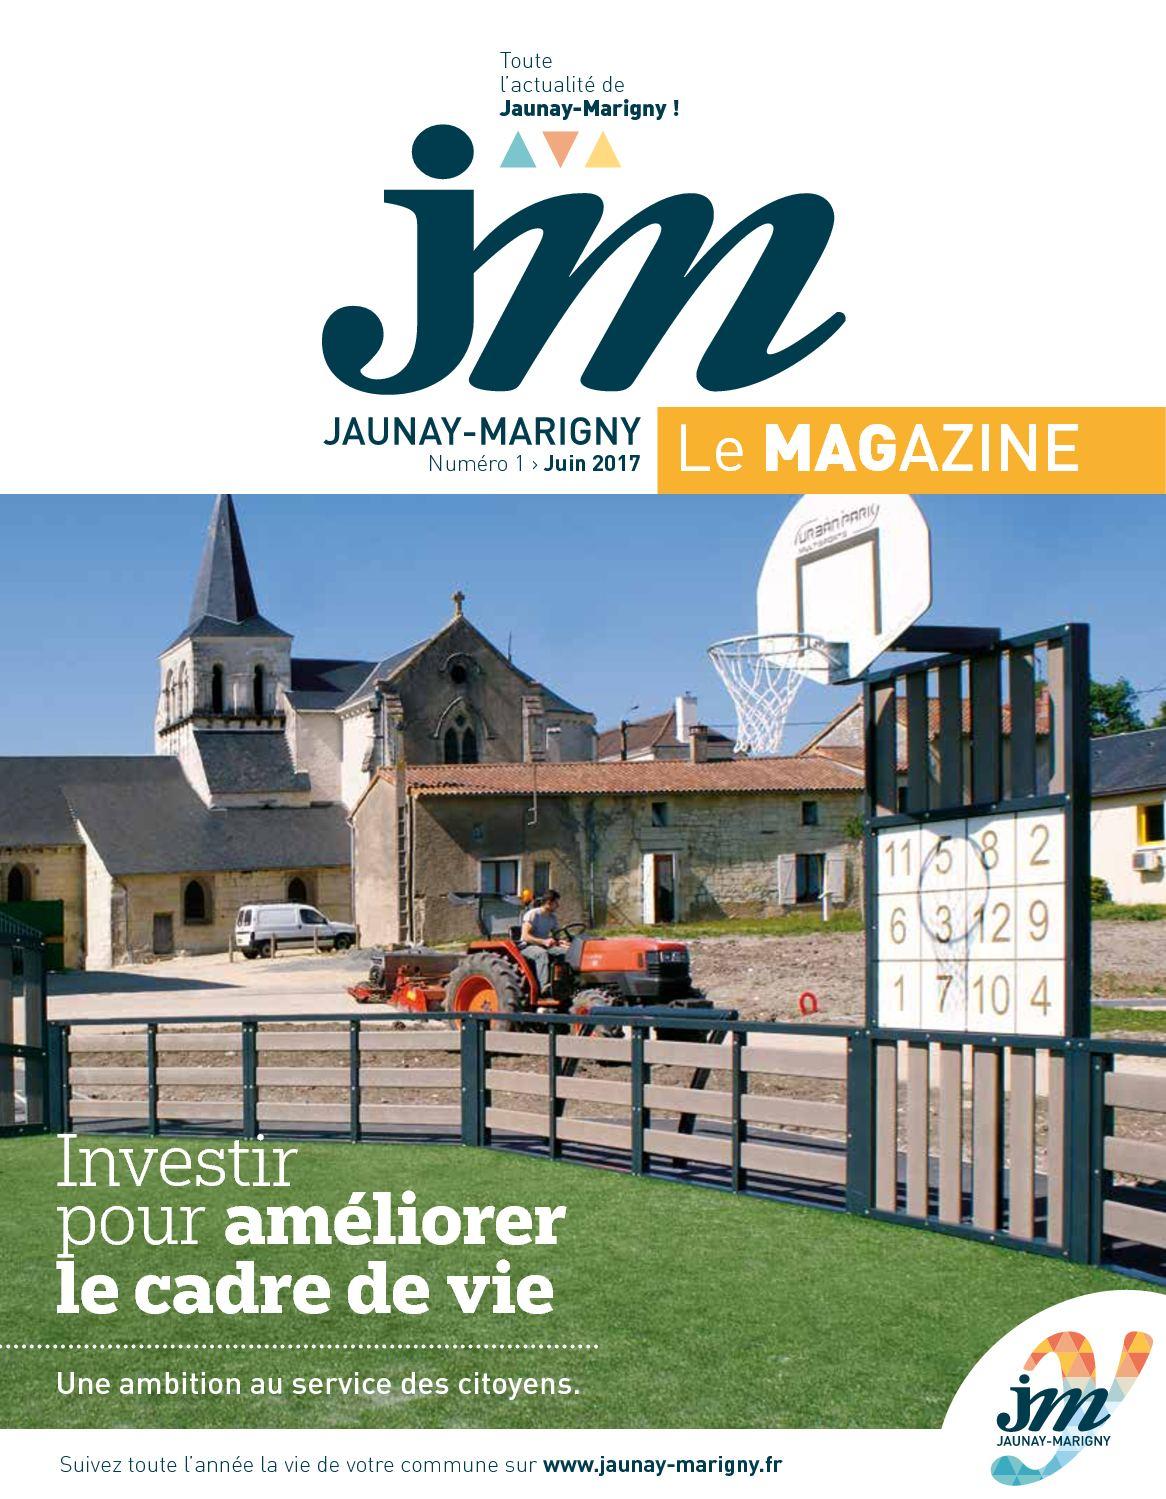 calam�o - jaunay-marigny, le magazine ! n�1